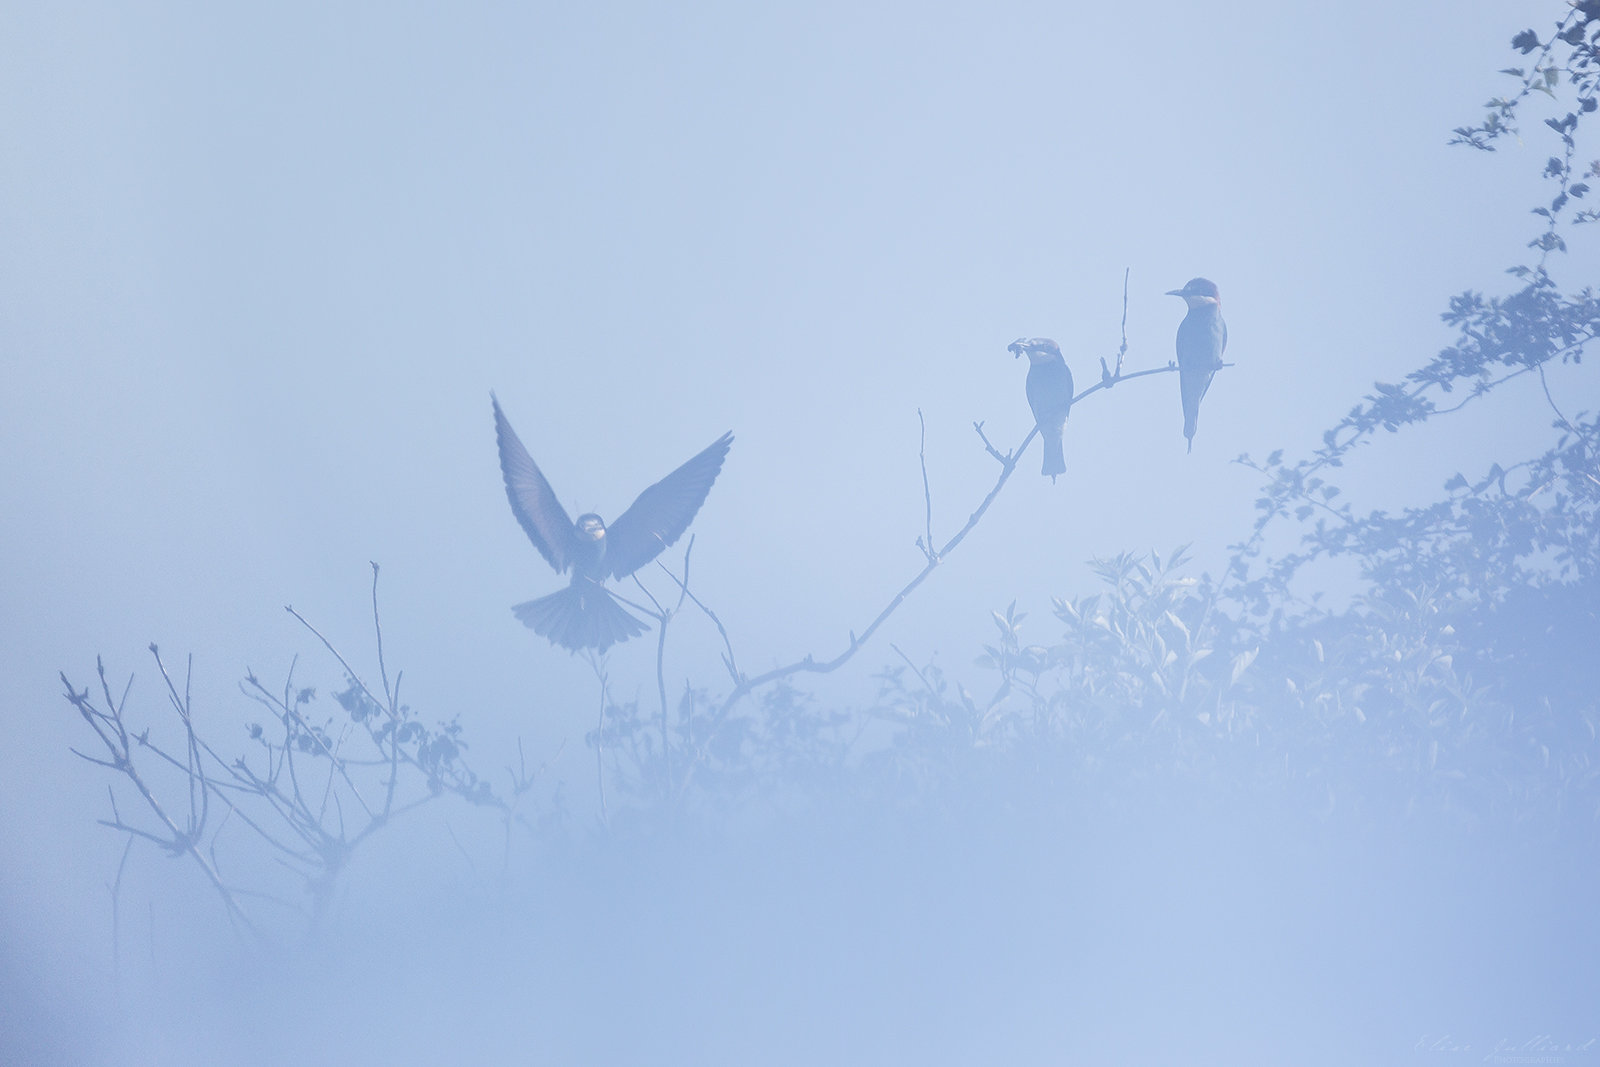 elise-julliard-photographe-oiseaux-animalier-guepiers-europe-lyon-miribel-jonage-rhone-alpes